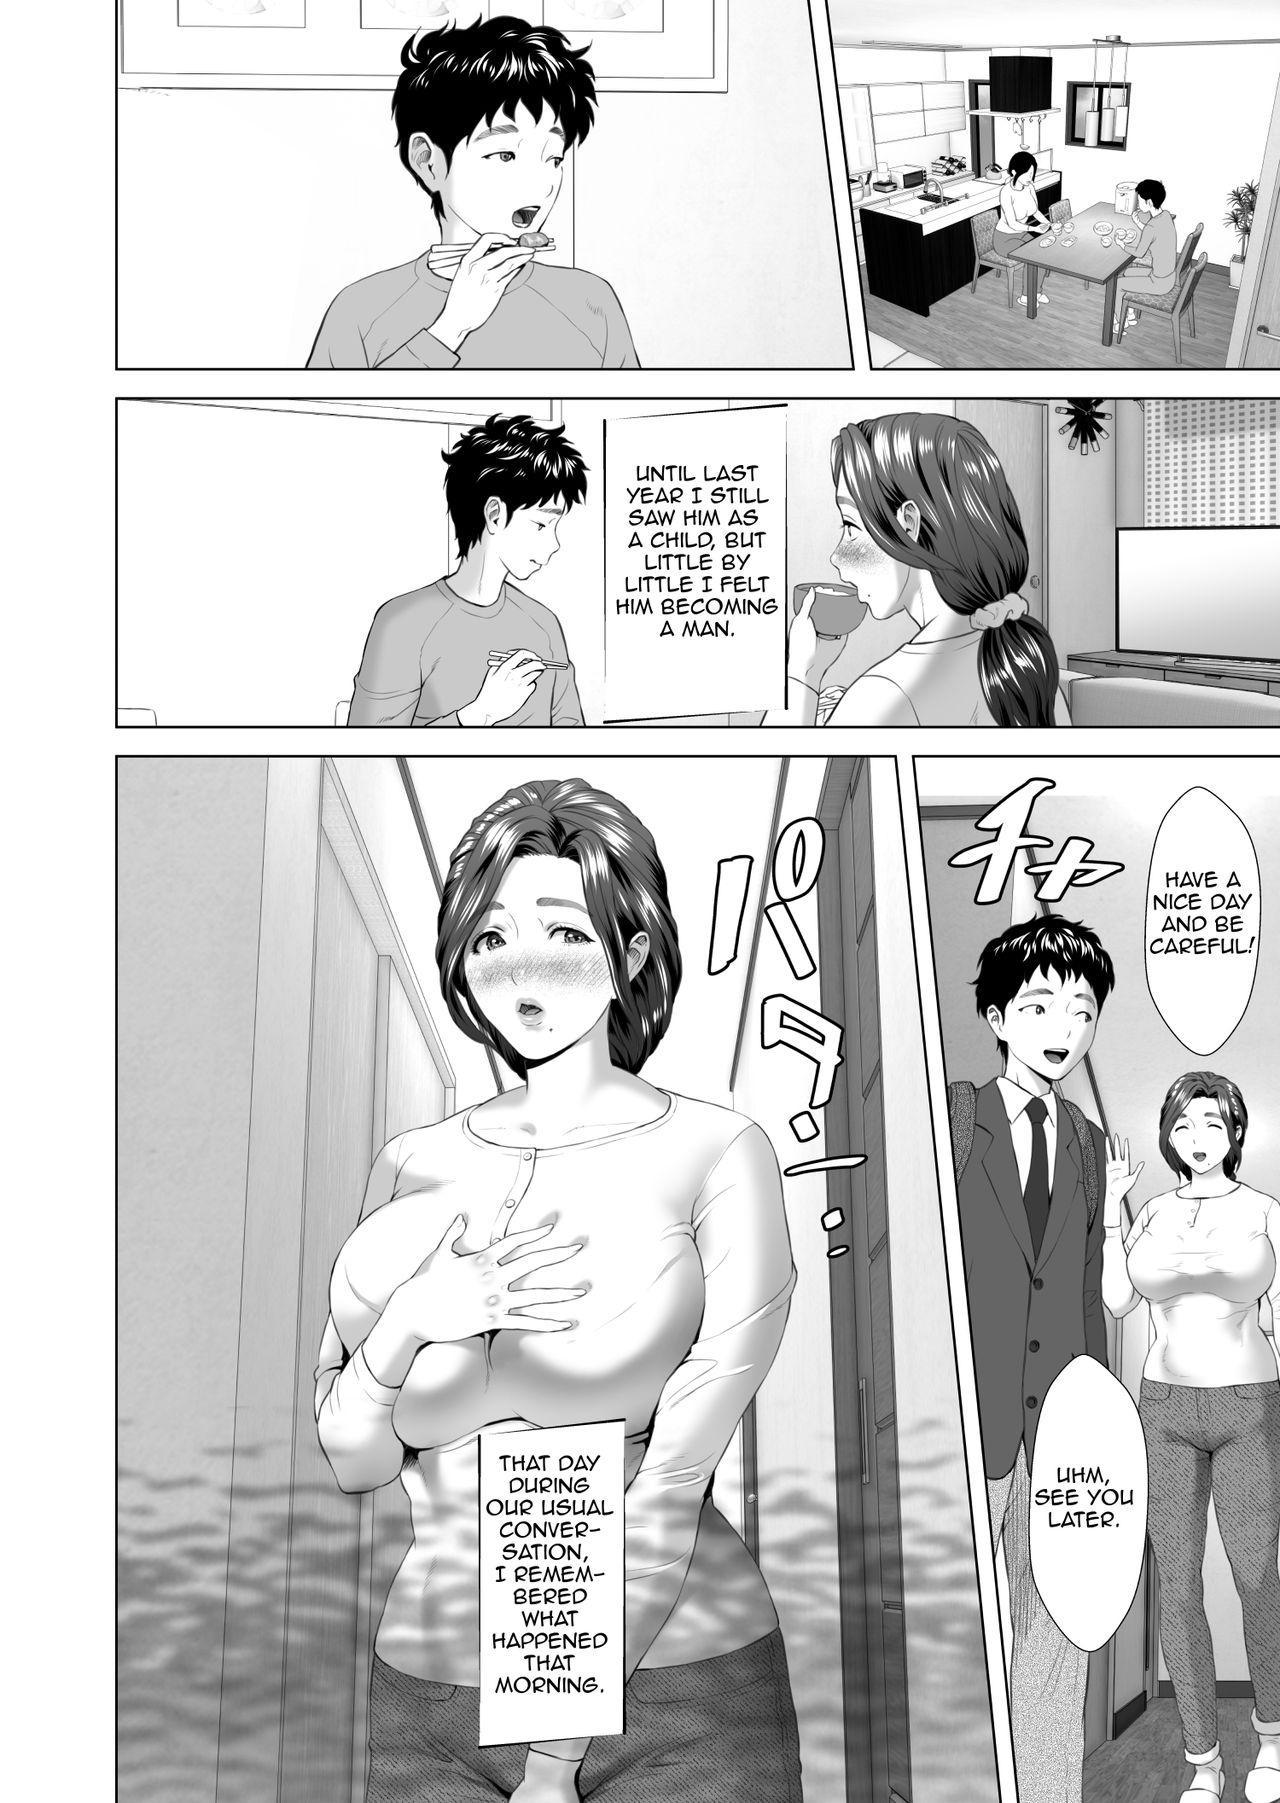 Kinjo Yuuwaku Musuko o Yobai ni Sasou Haha Hen | Neighborhood Seduction Mother Lures Son for a Night Visit! 5